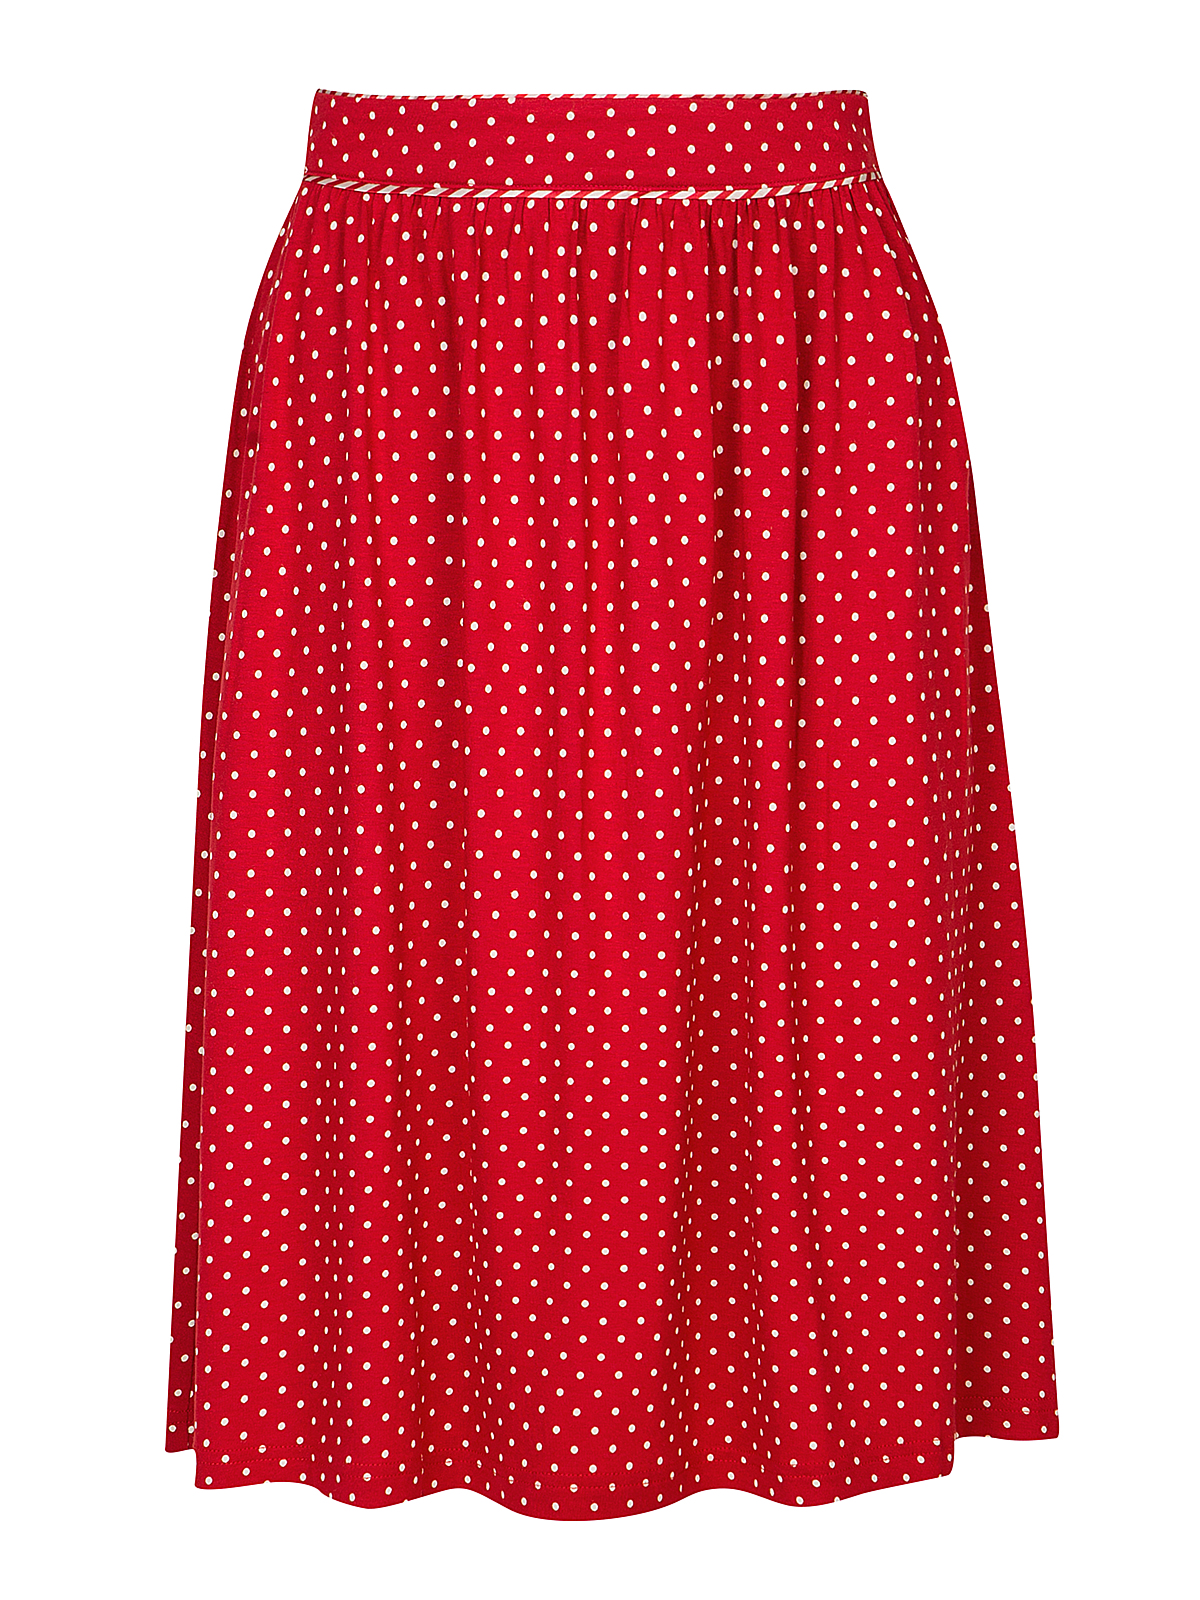 Roecke - Vive Maria Monaco Skirt Red Allover – Größe S  - Onlineshop NAPO Shop